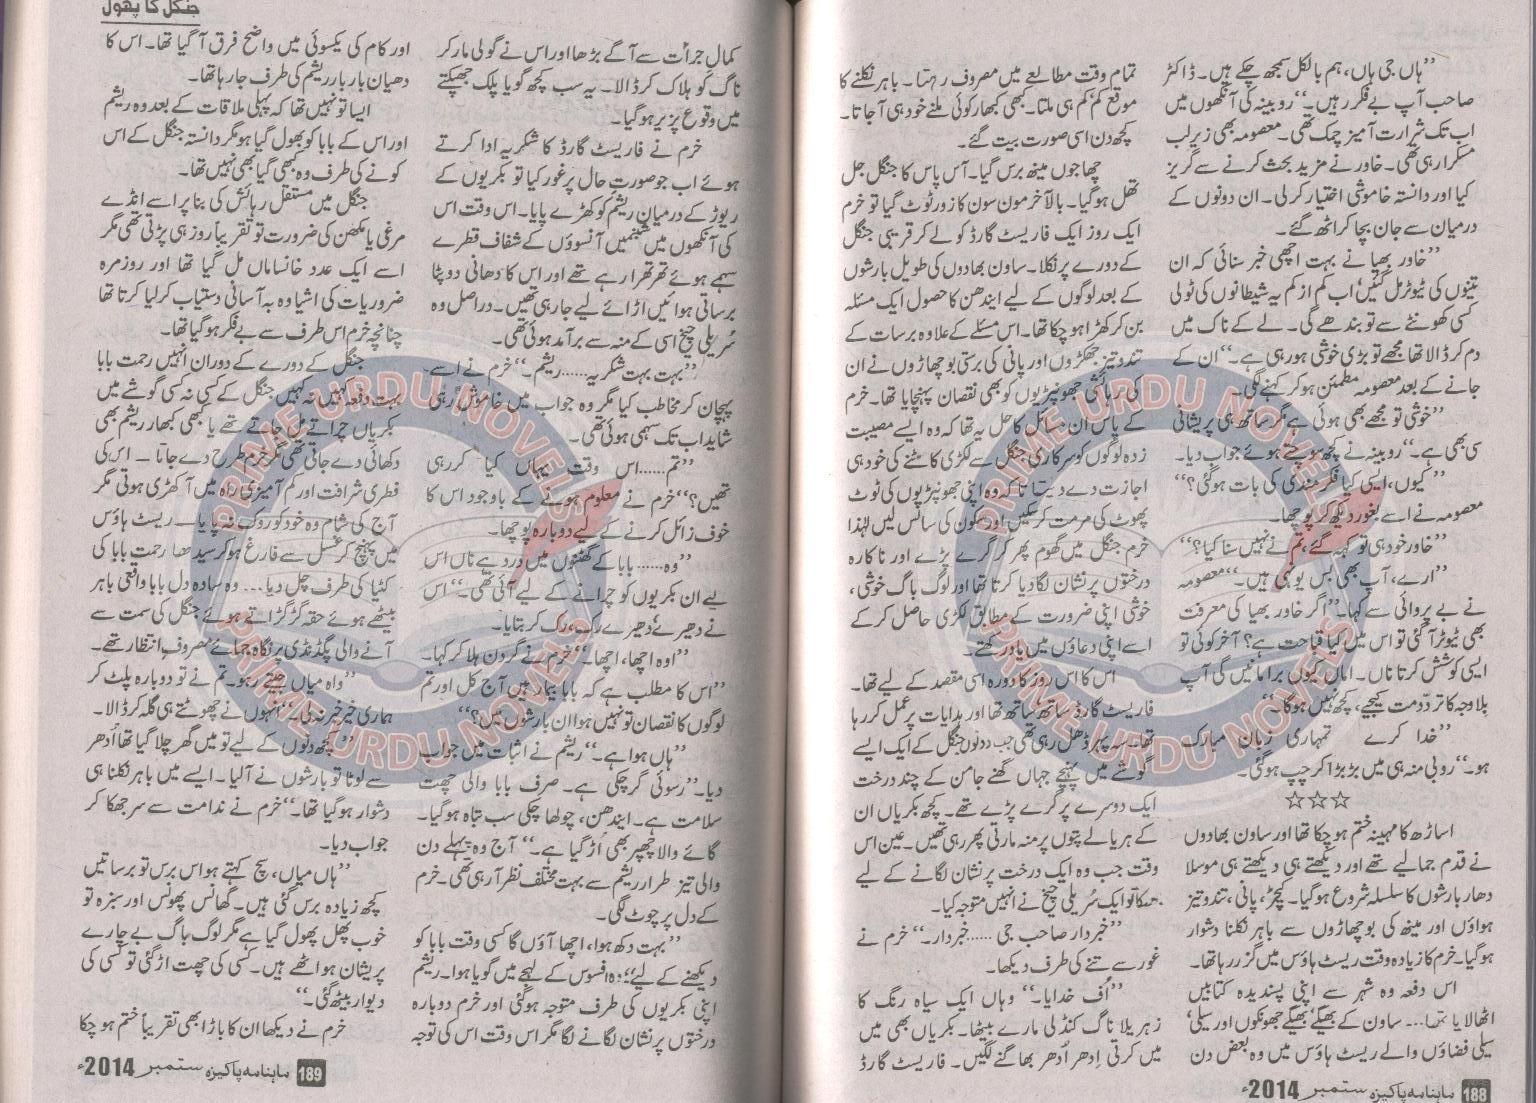 ghulab ka phool essay Please provide me 15 sentance essay in hindi on the topic gulab(rose.